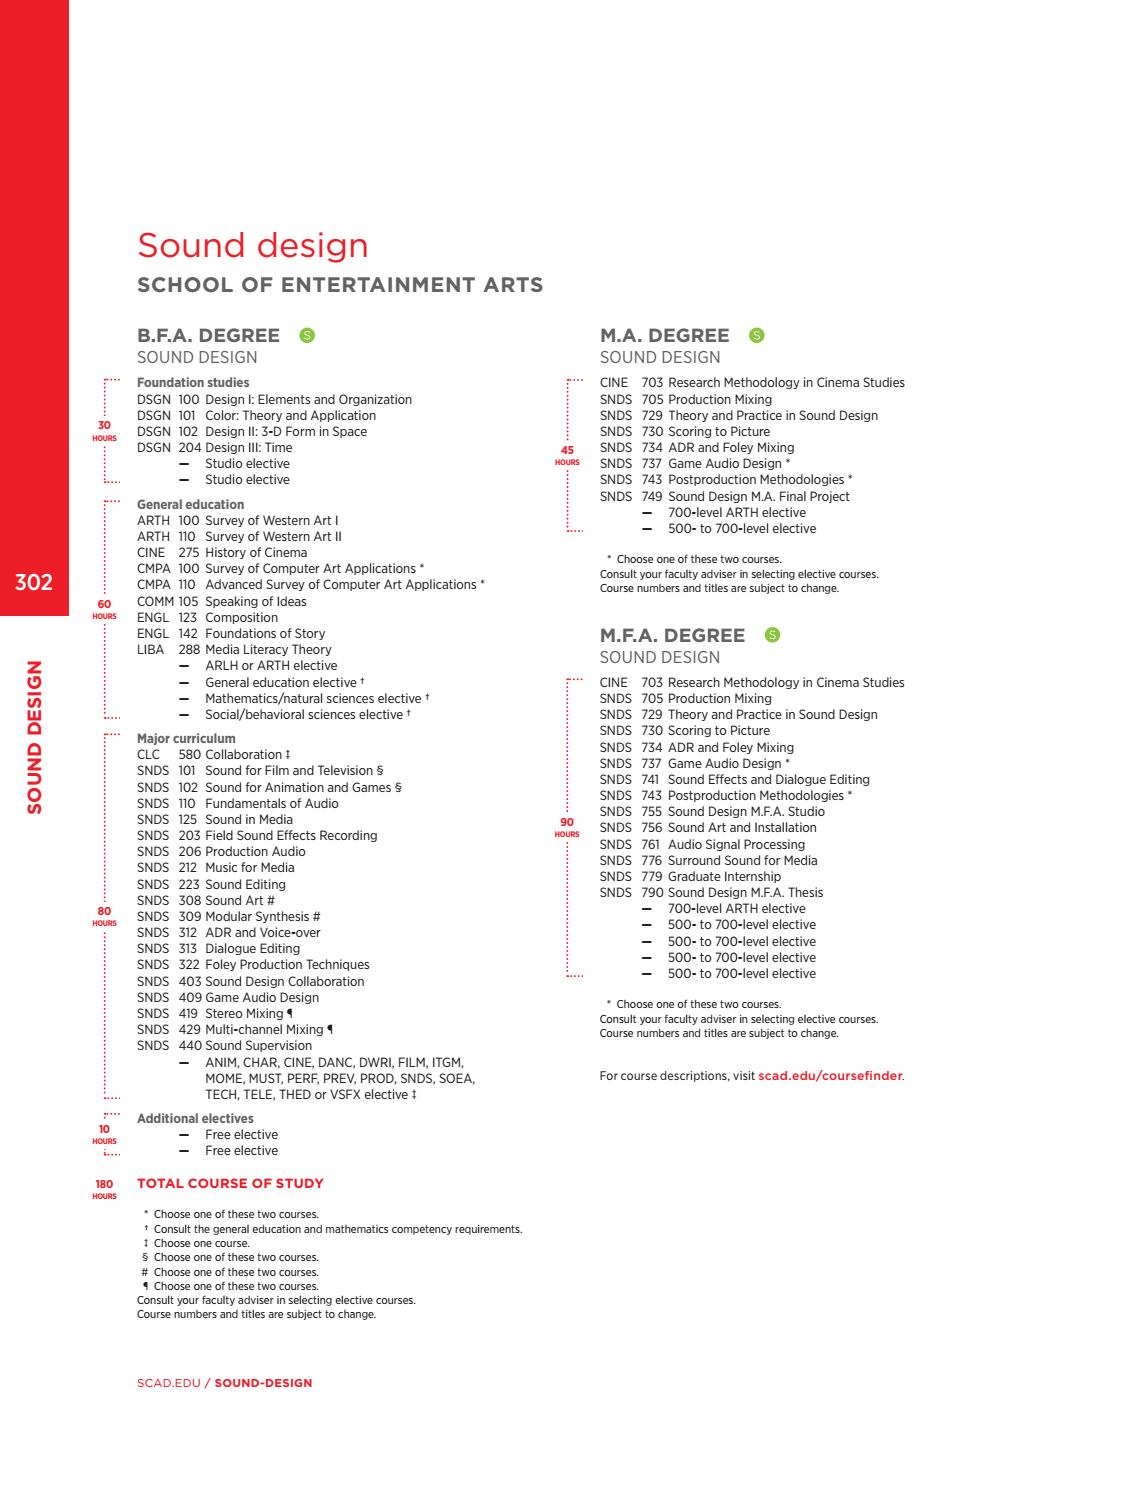 SCAD Academic Catalog By SCAD Issuu - Audio design document